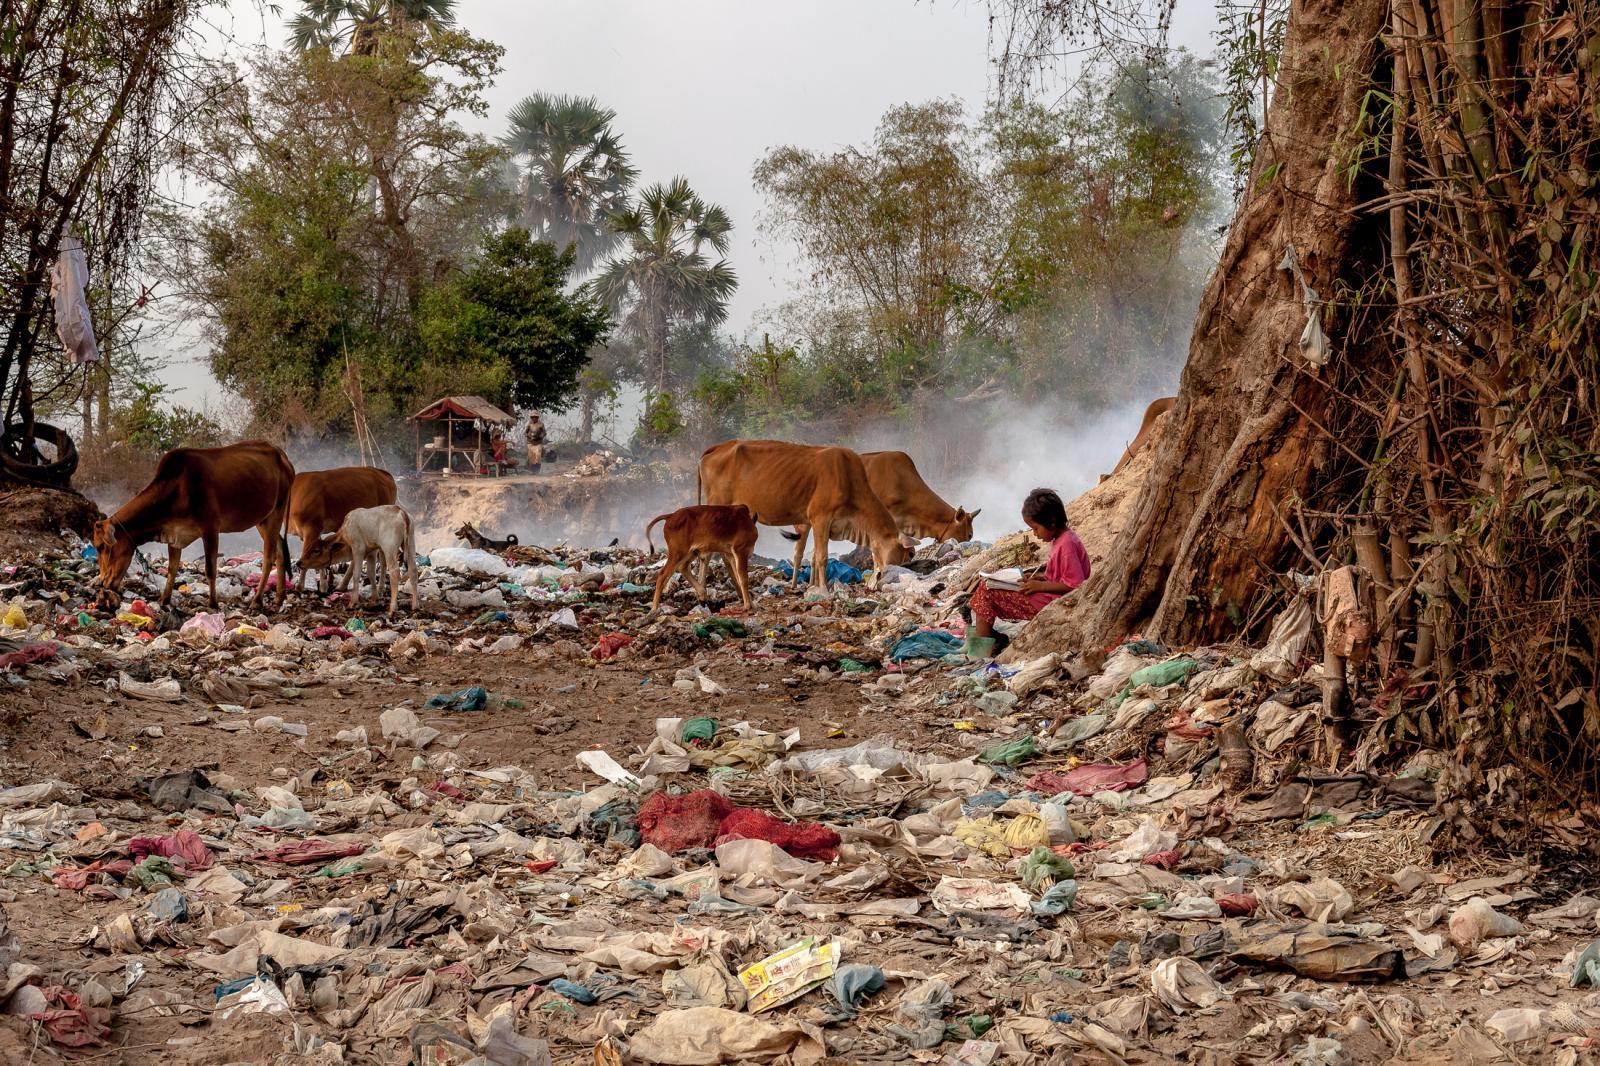 Photography image - Loading 003_Rubbish_Cambodia.jpg